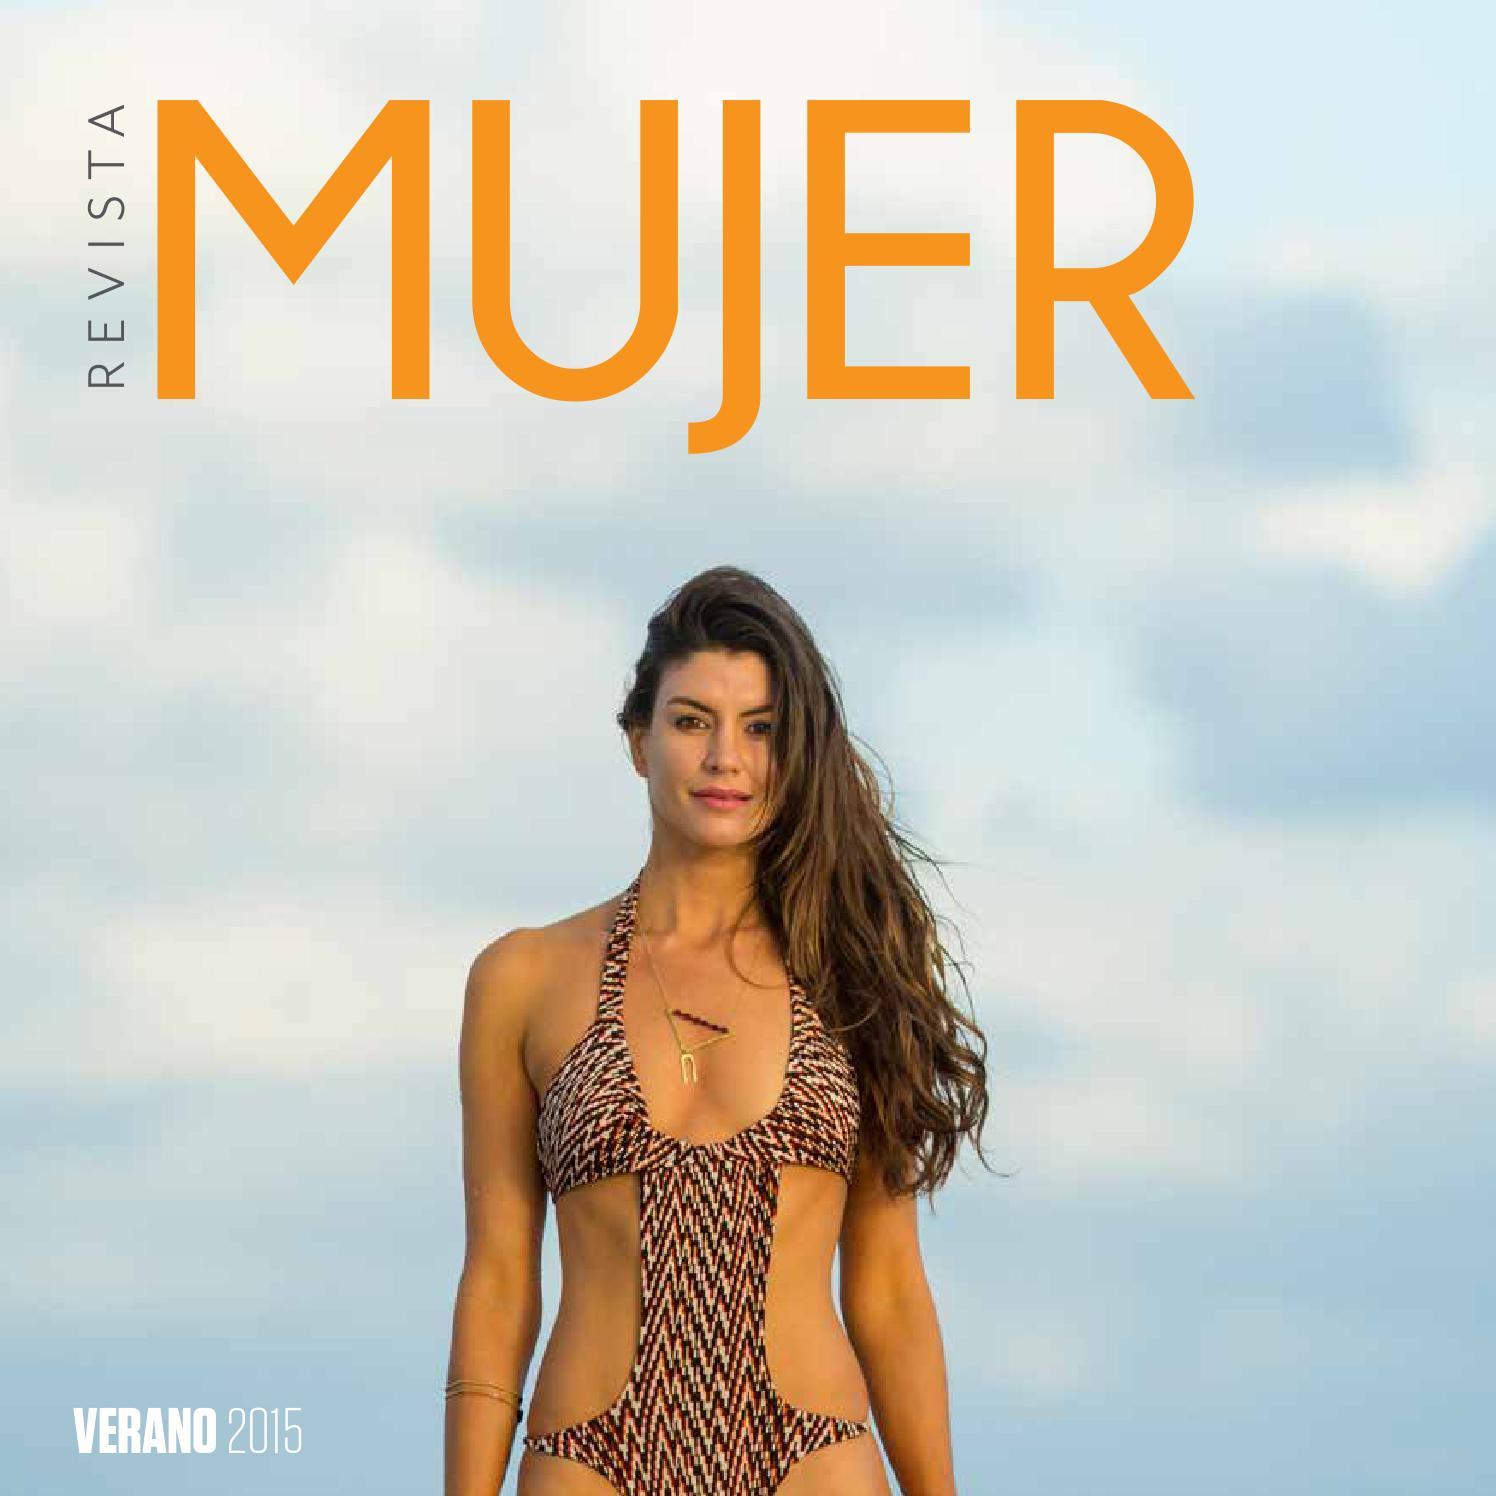 Revista MUJER Verano 2015 by REVISTA MUJER - issuu